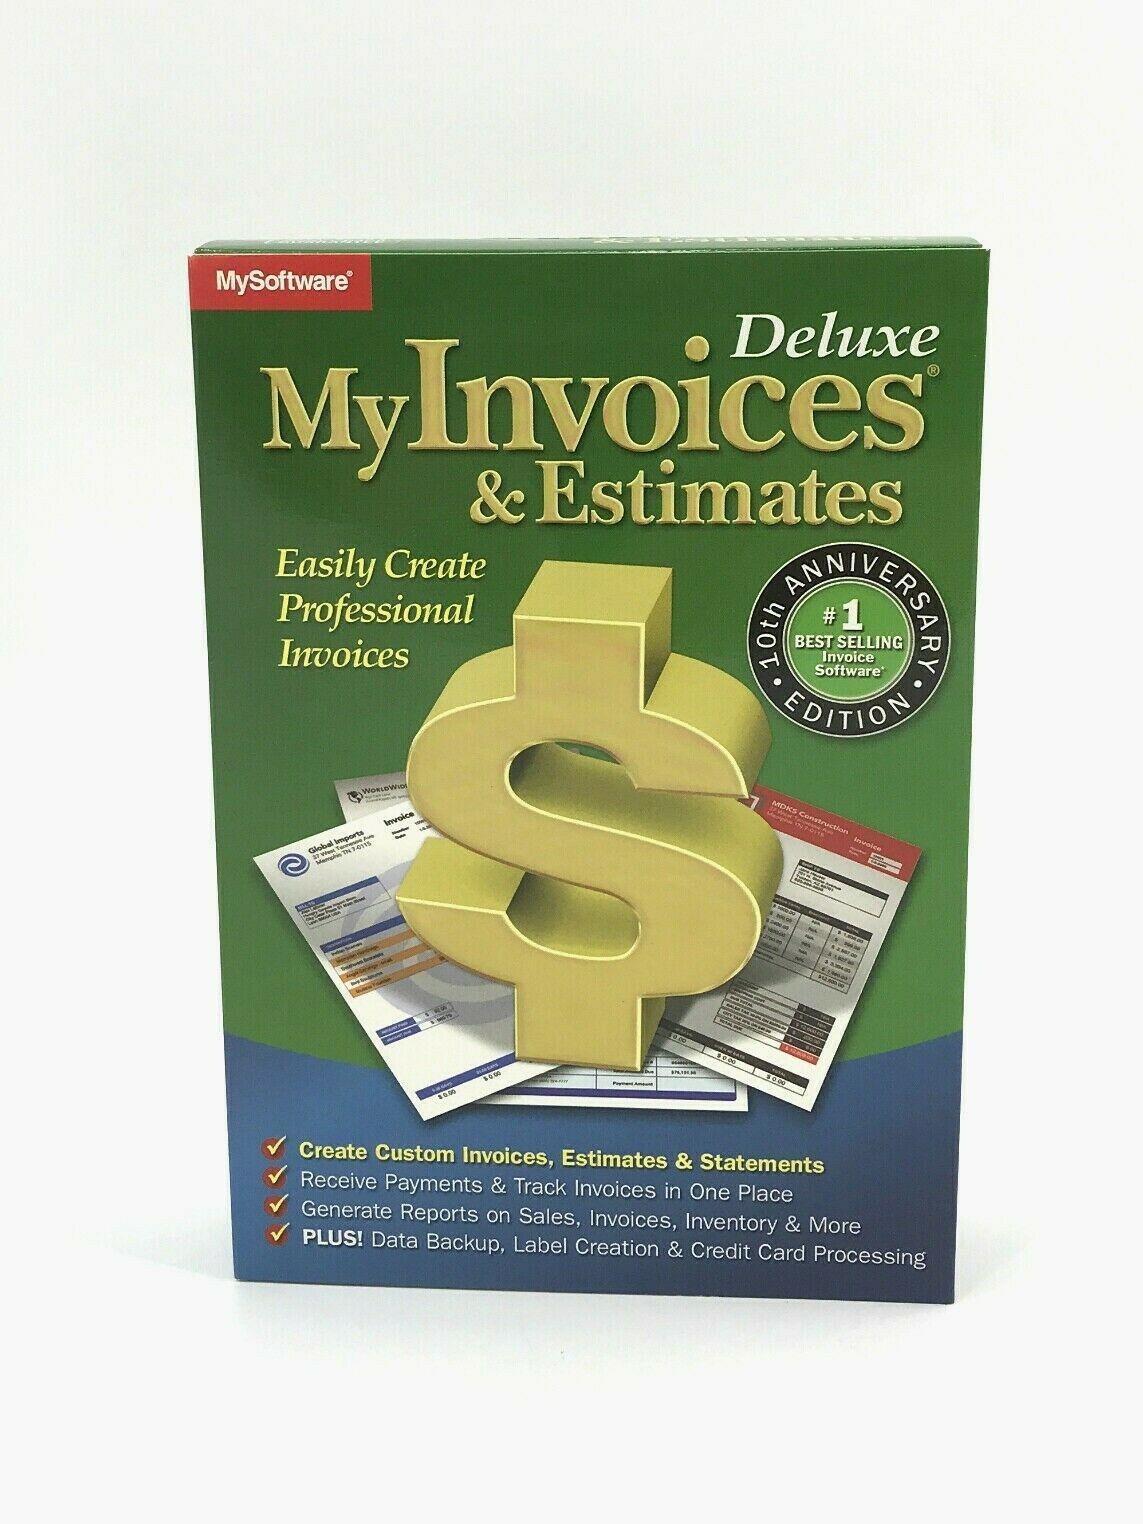 my invoices estimates deluxe 10 for windows professional 0602 myinvoices & estimates deluxe